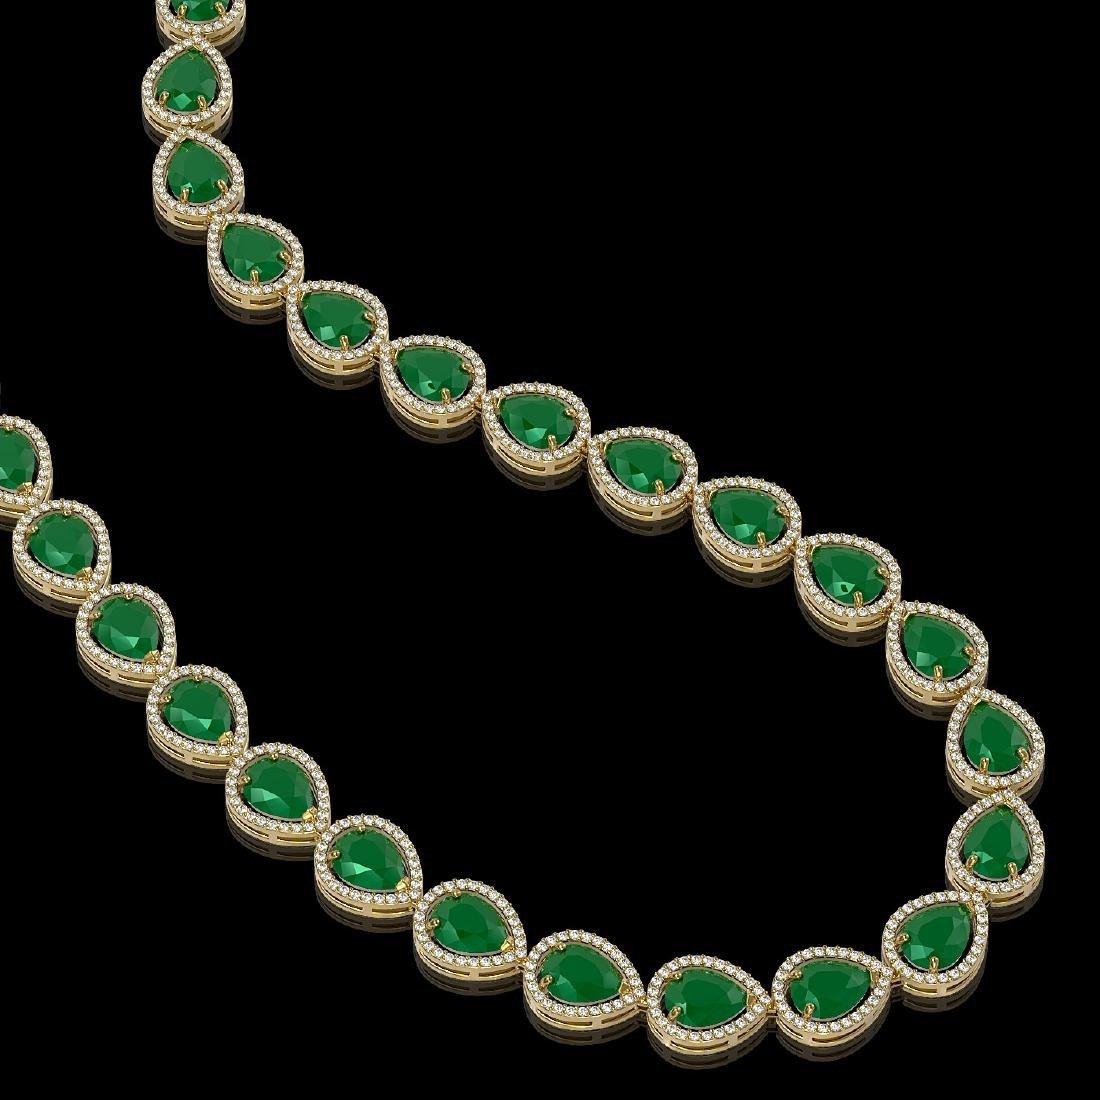 64.01 CTW Emerald & Diamond Halo Necklace 10K Yellow - 2